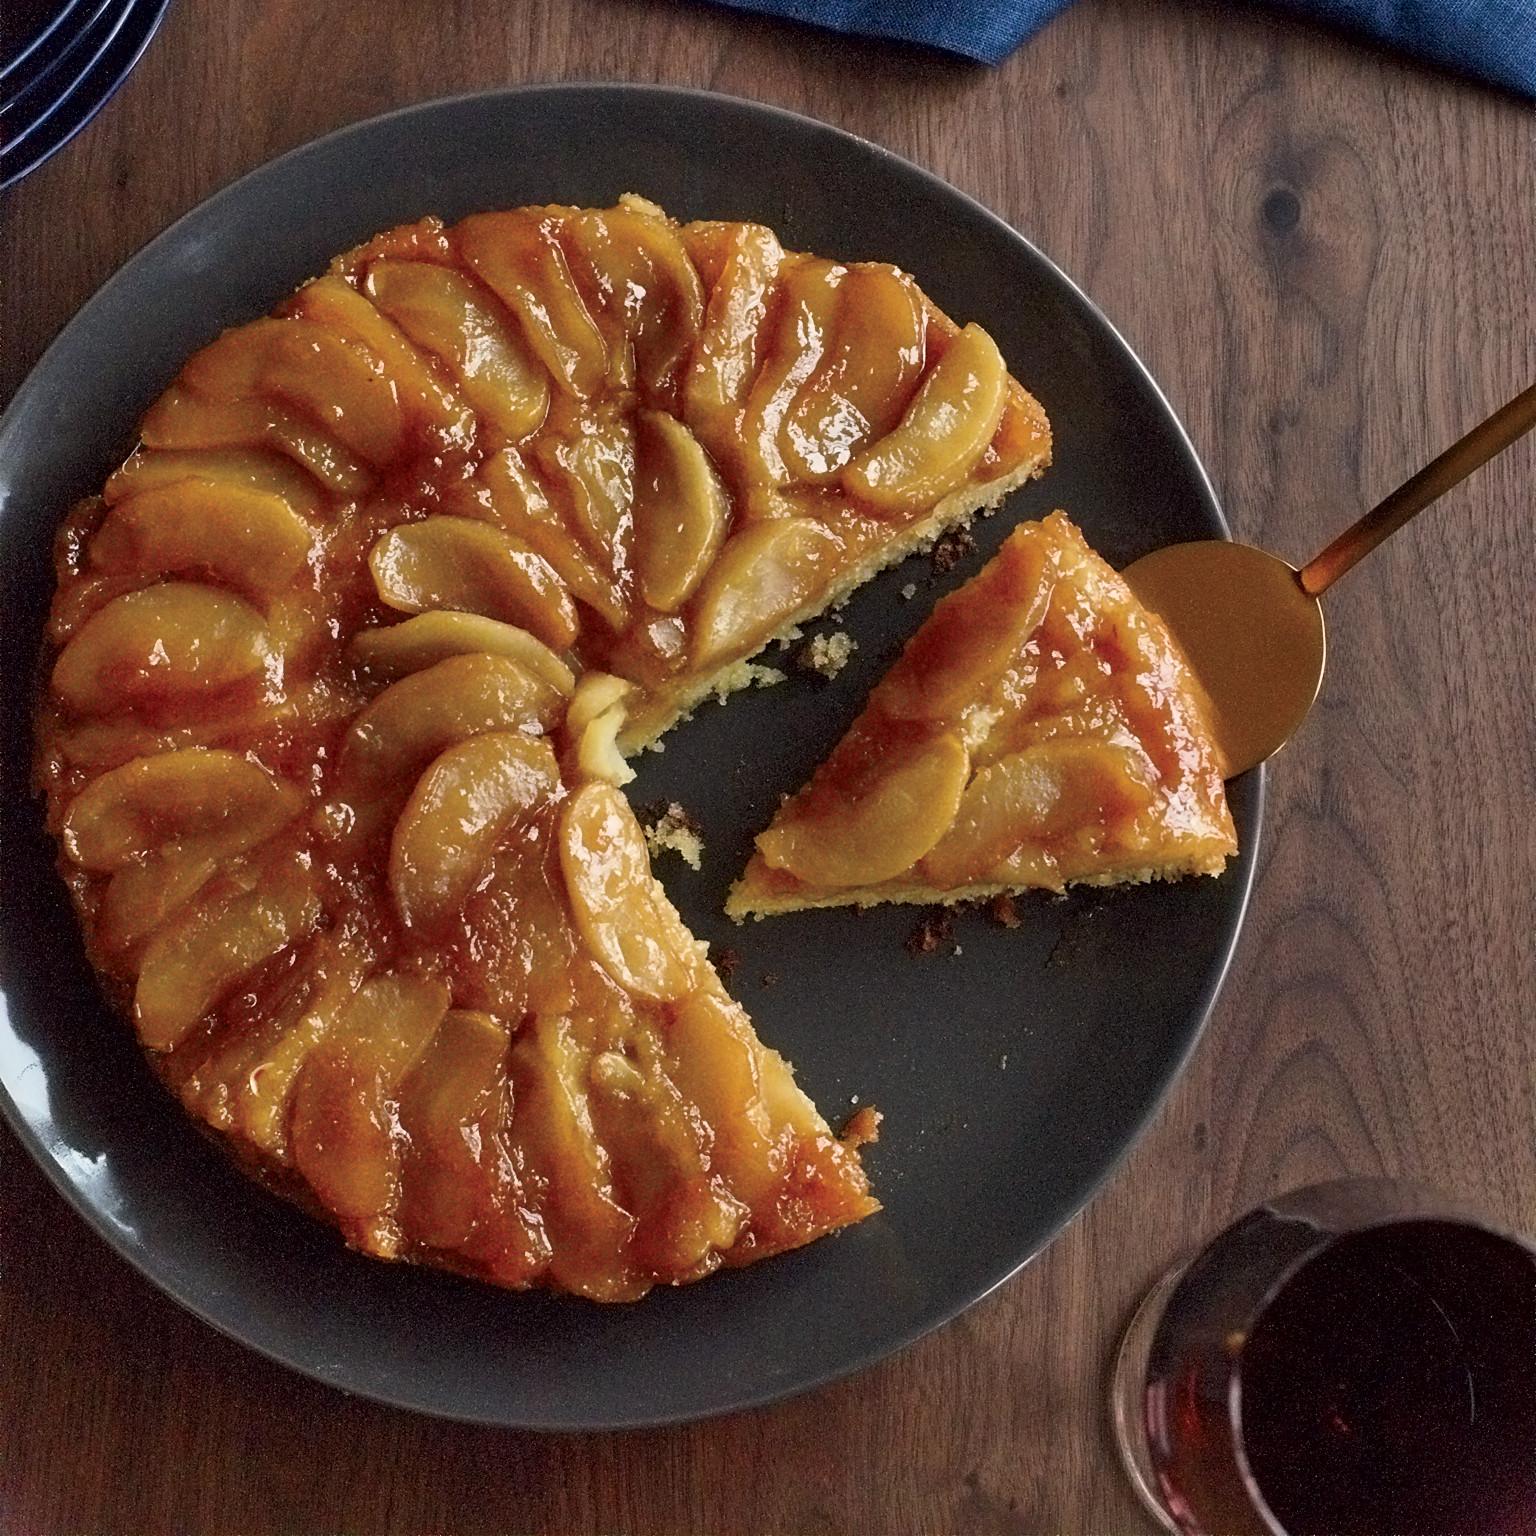 Fall Apple Desserts  Maple Apple Upside Down Cake Recipe Joanne Chang